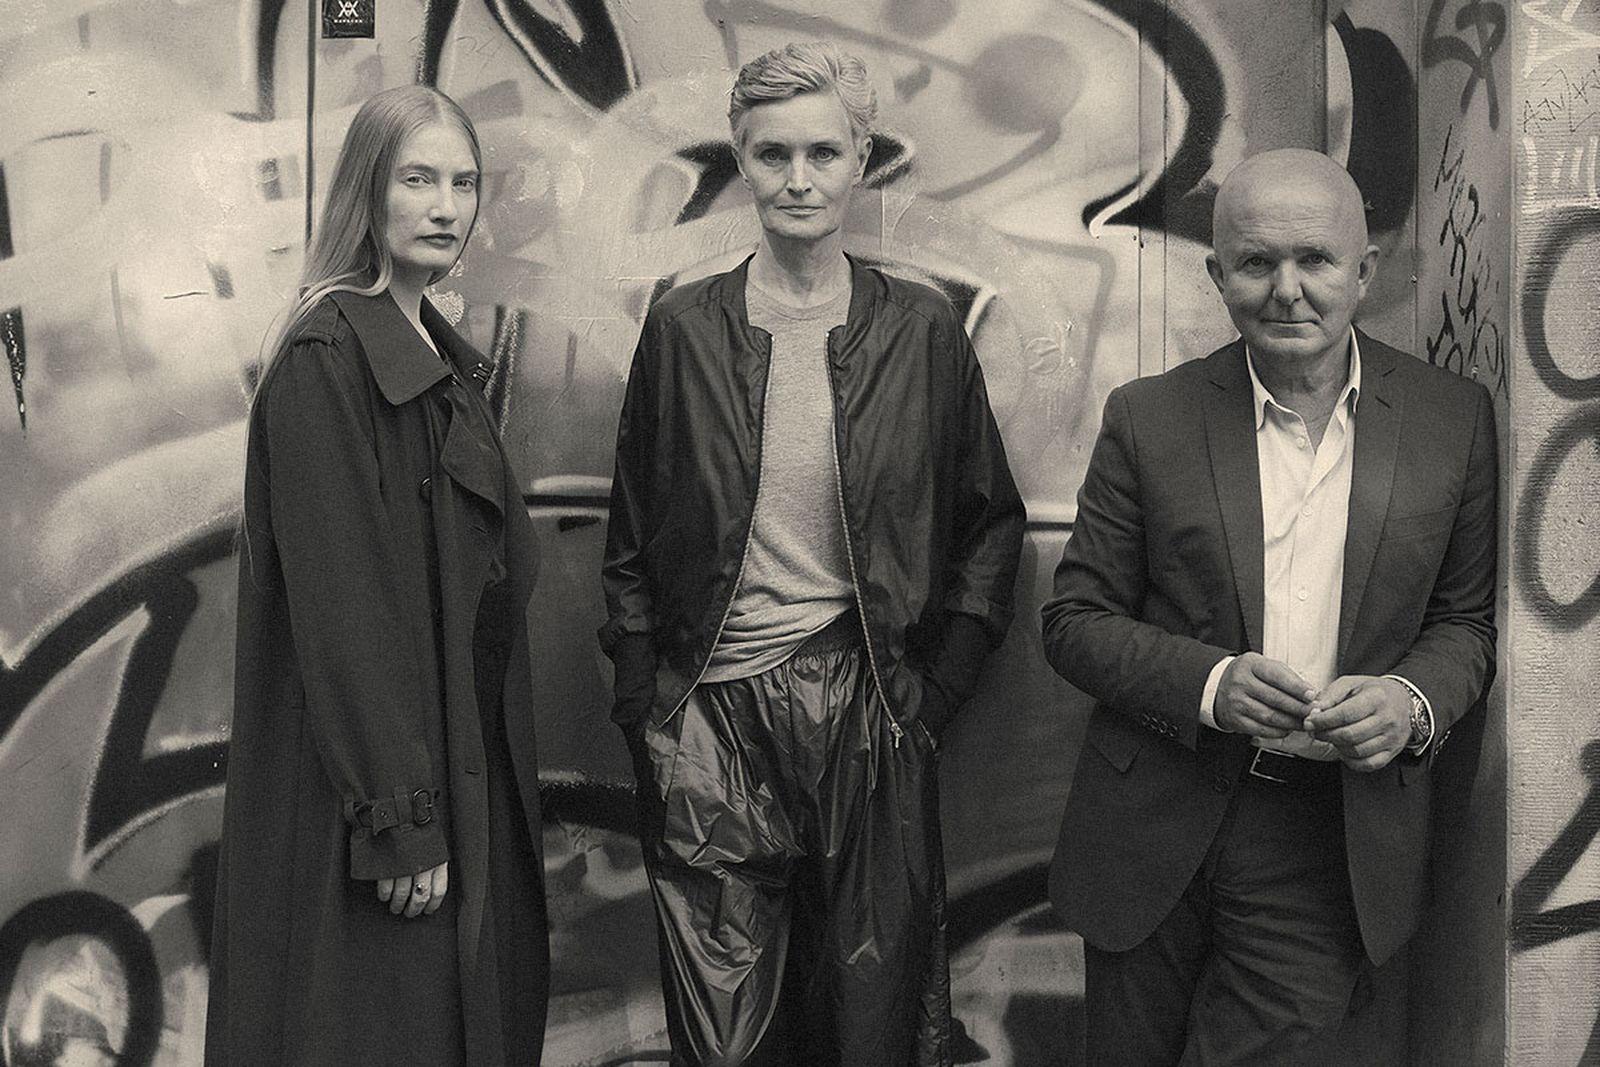 berghain-studio-berlin-03